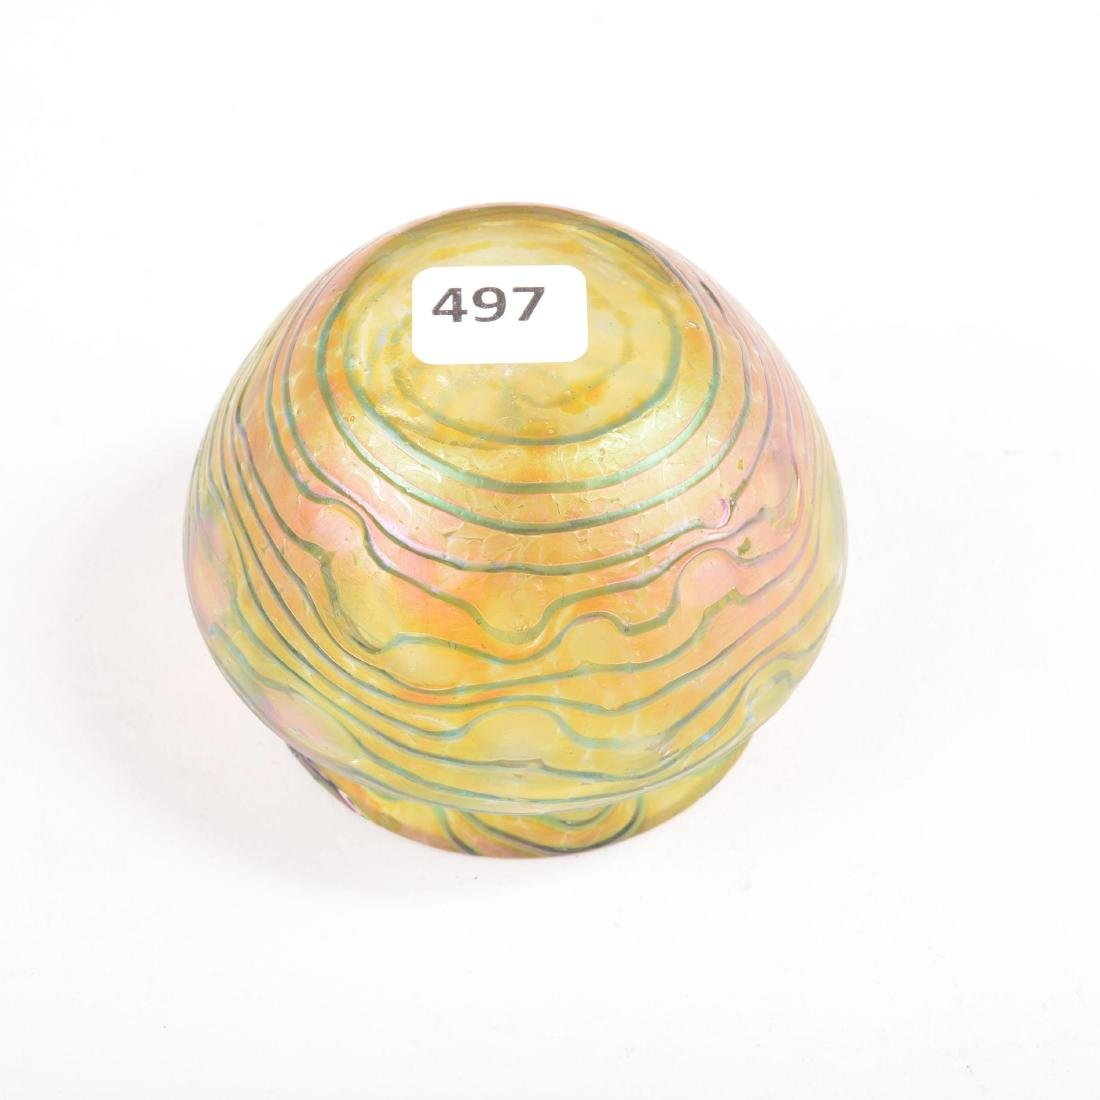 "Vase - Art Glass - 2.5"" X 3.5"" - 2"